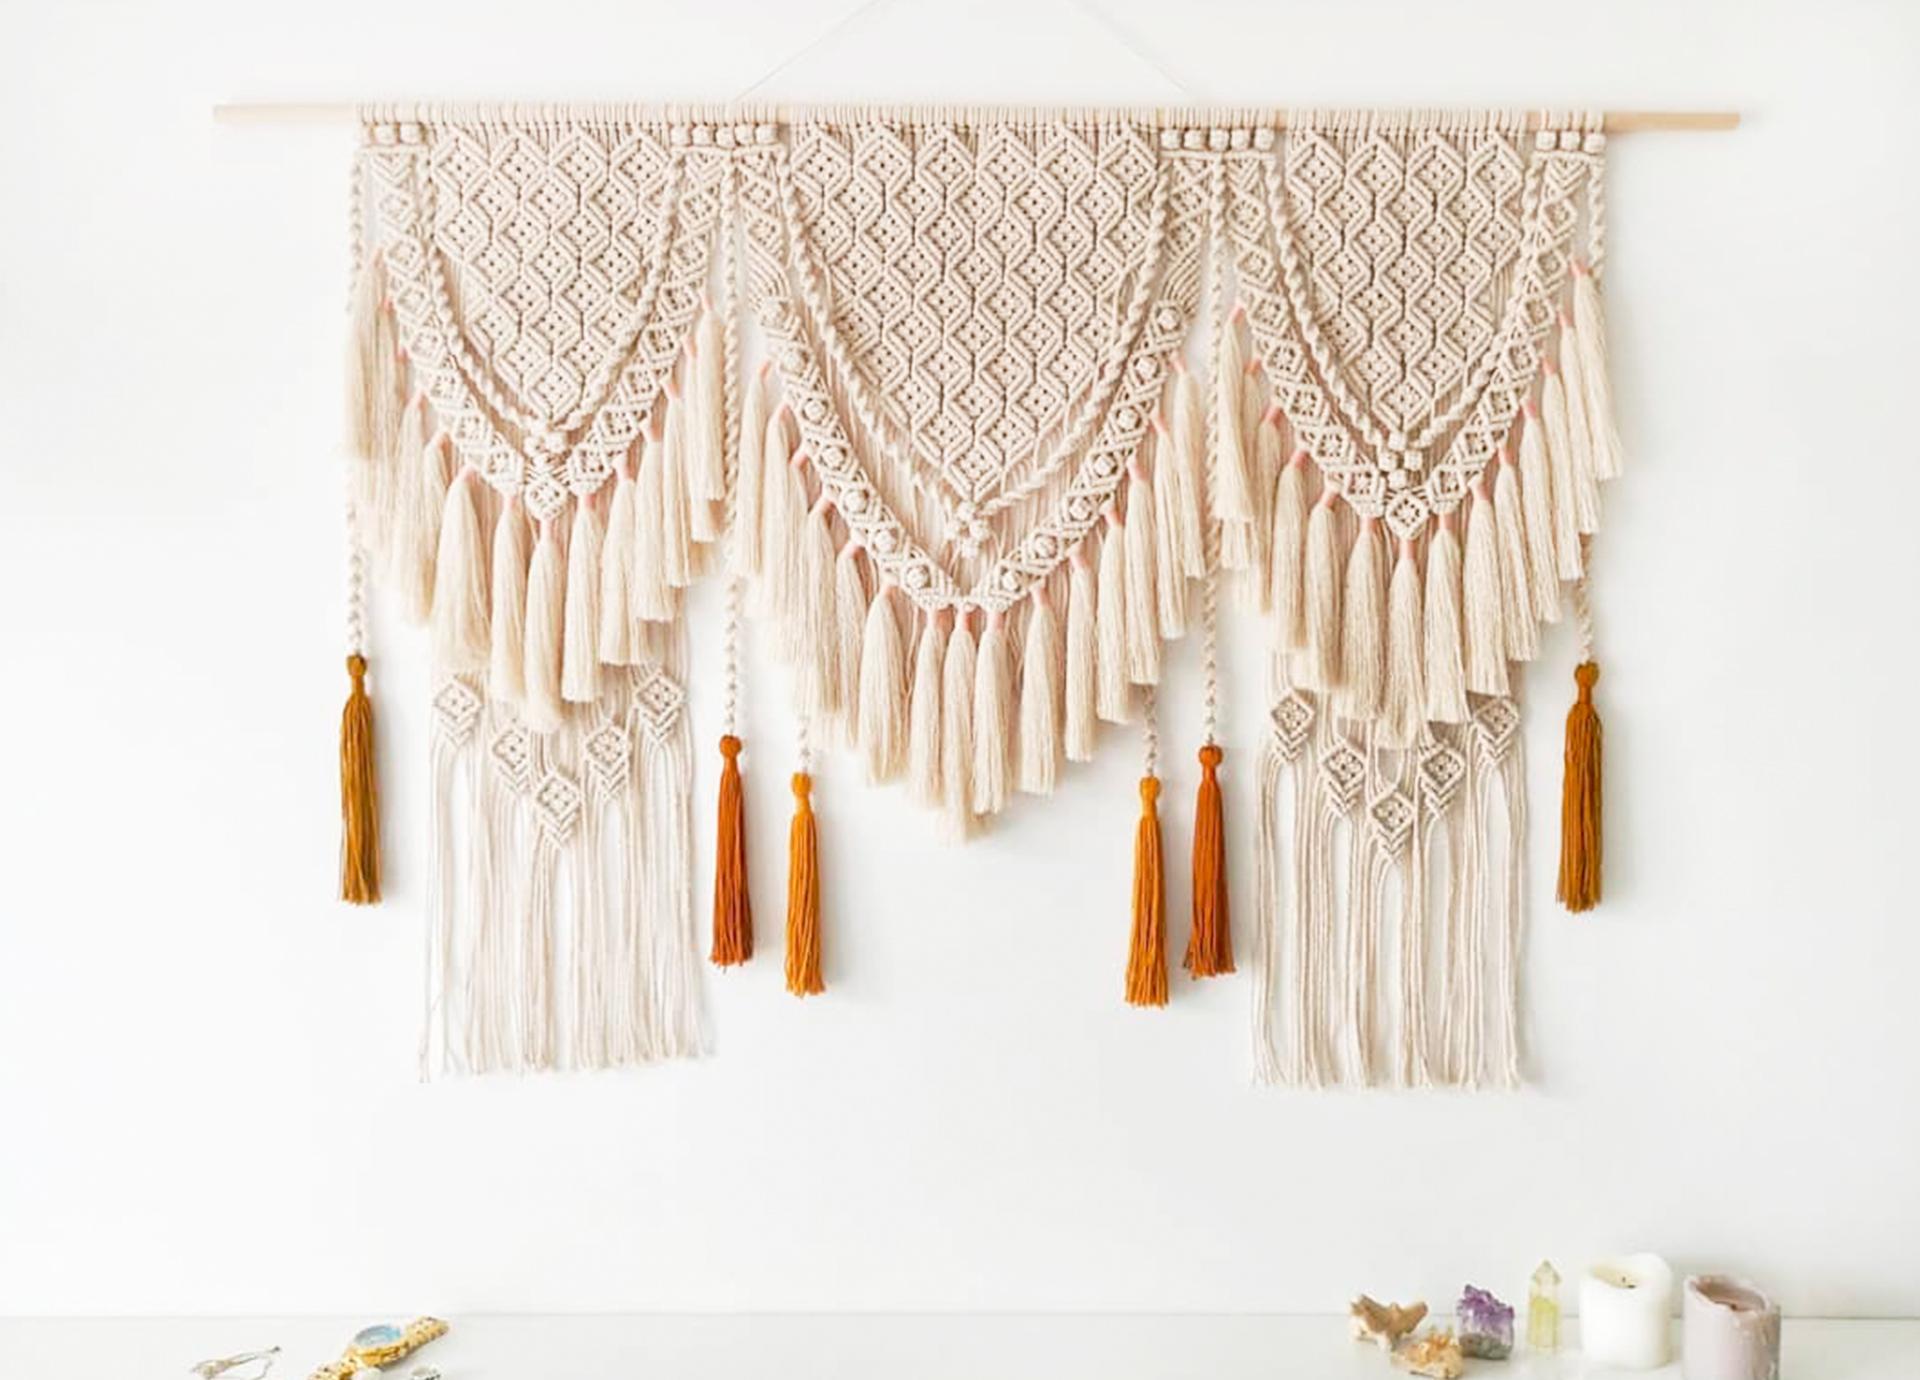 Alesia Hnatiuk weaving macramé